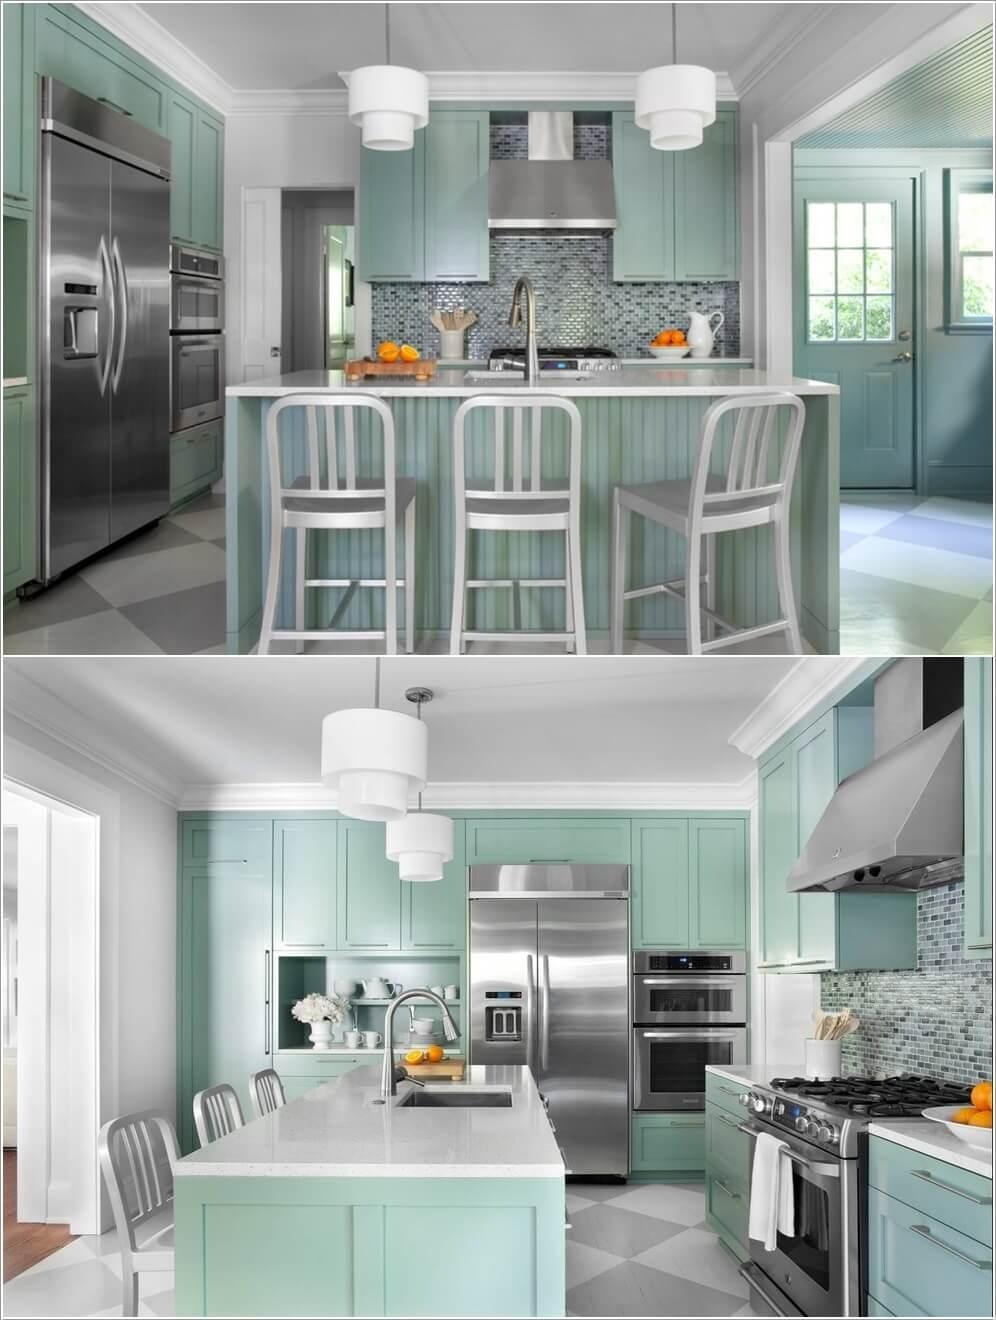 10 Gorgeous Pendant Light Designs for Your Kitchen